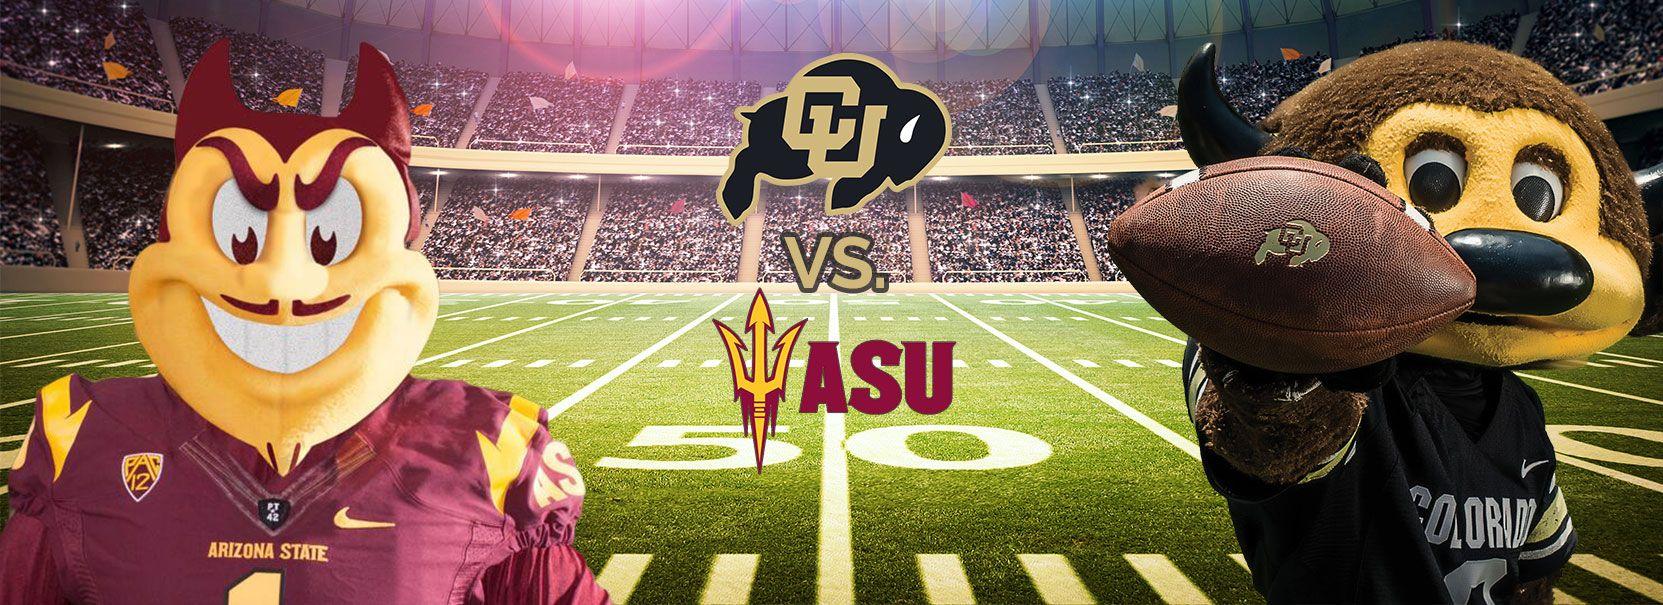 CU vs. ASU